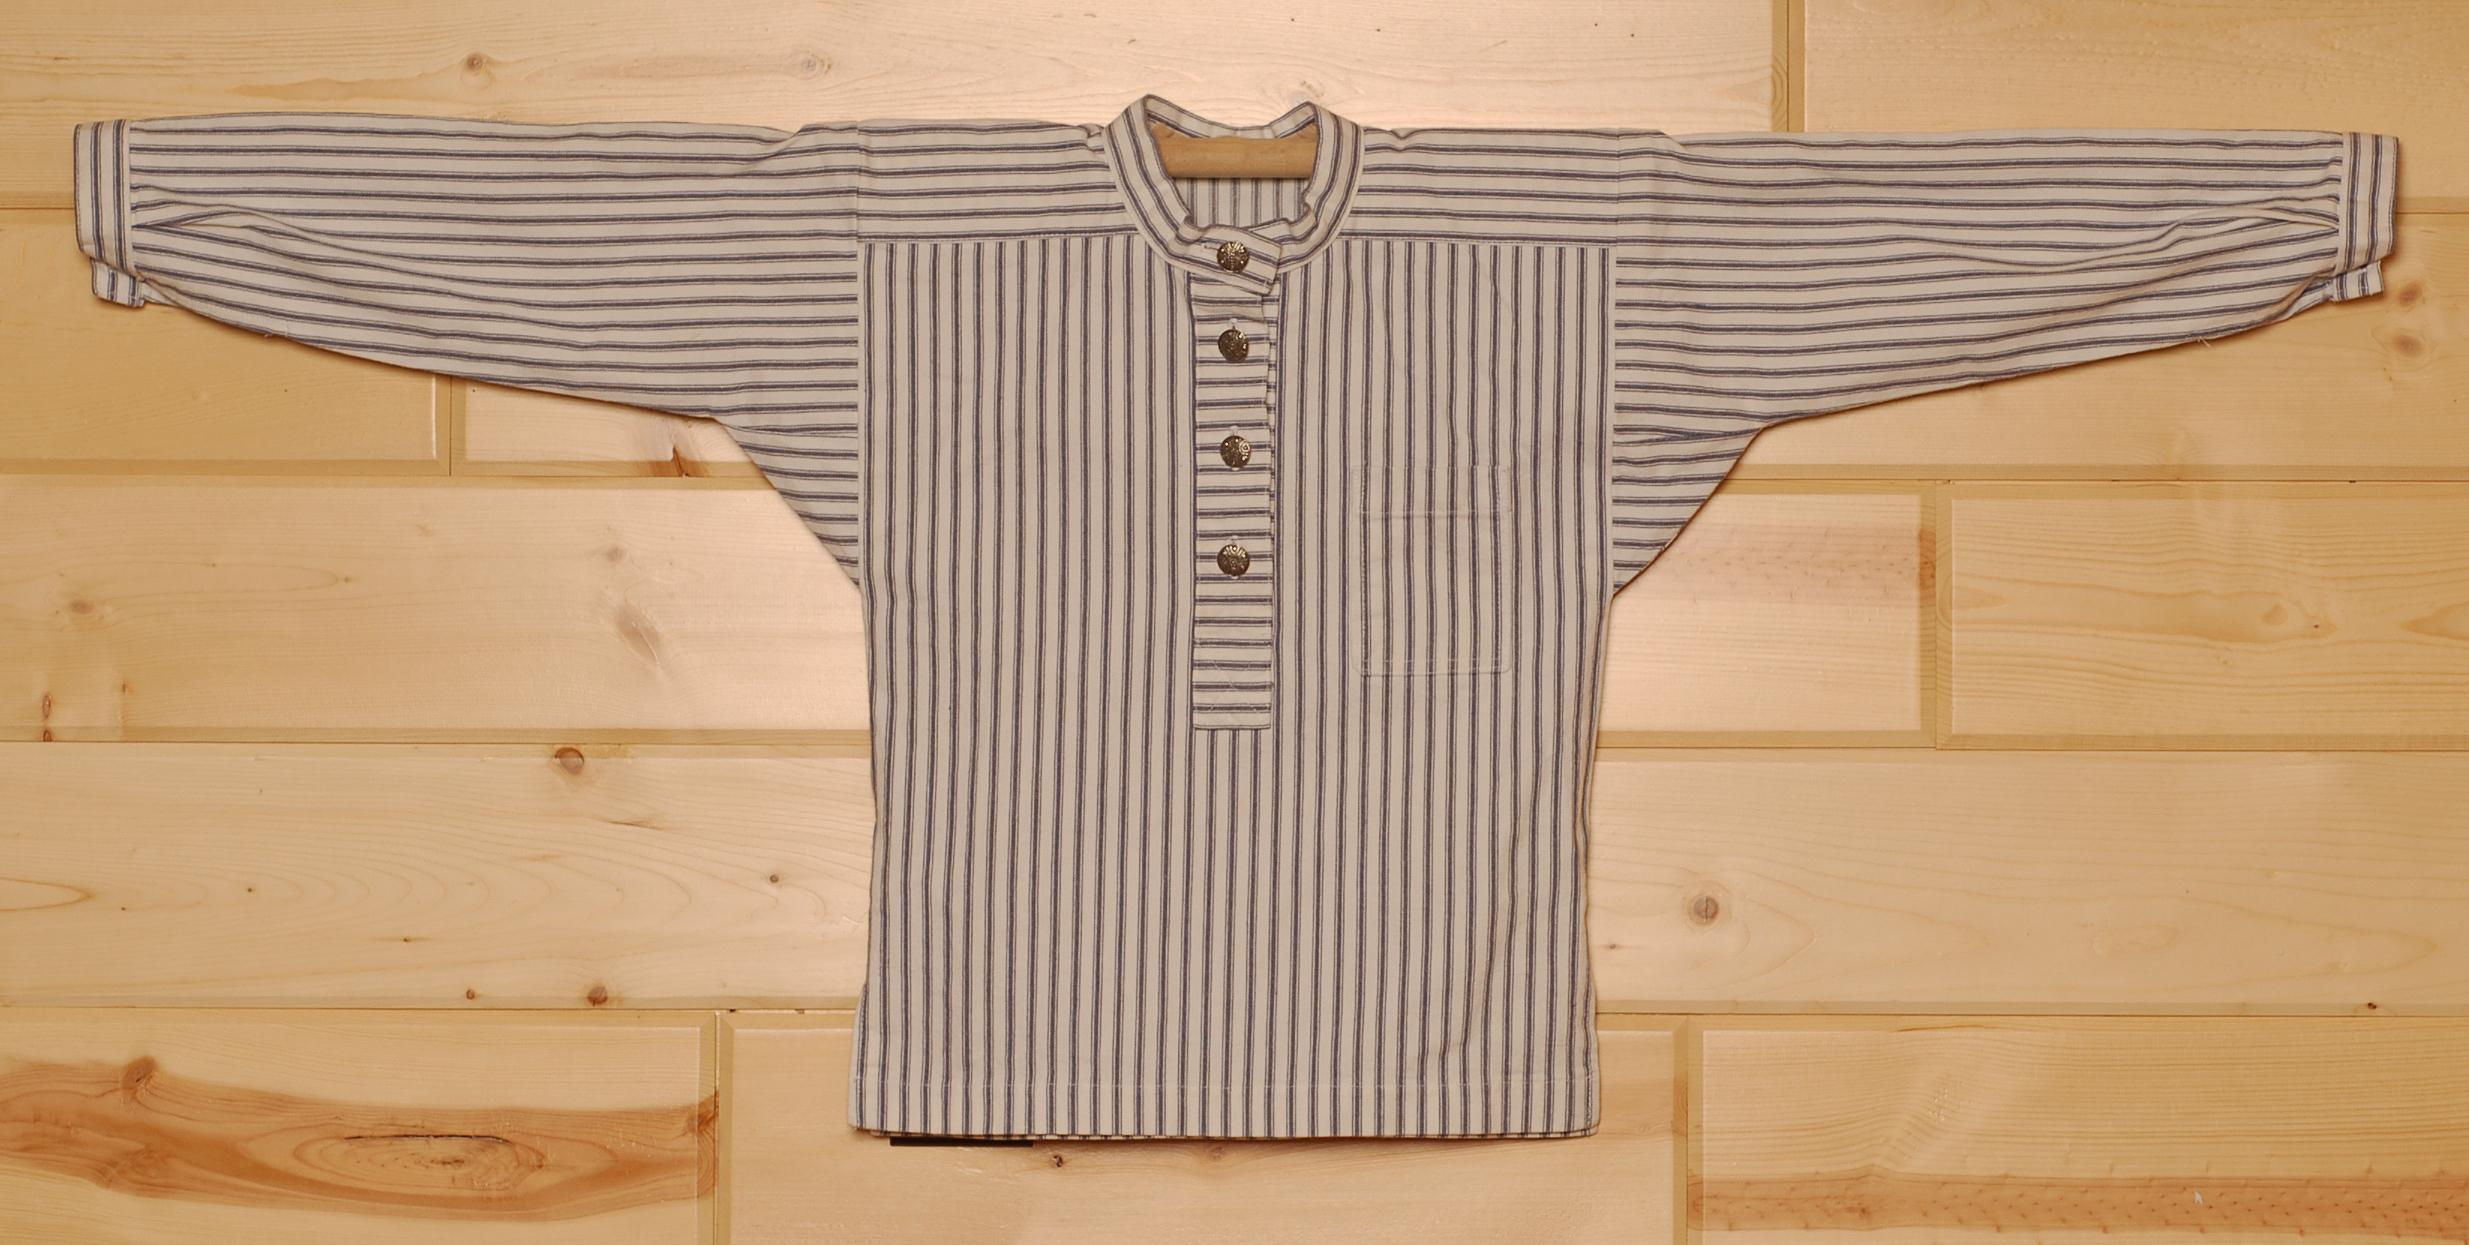 Colburn Sew Your Own Scandinavian Work Shirt 2.jpg